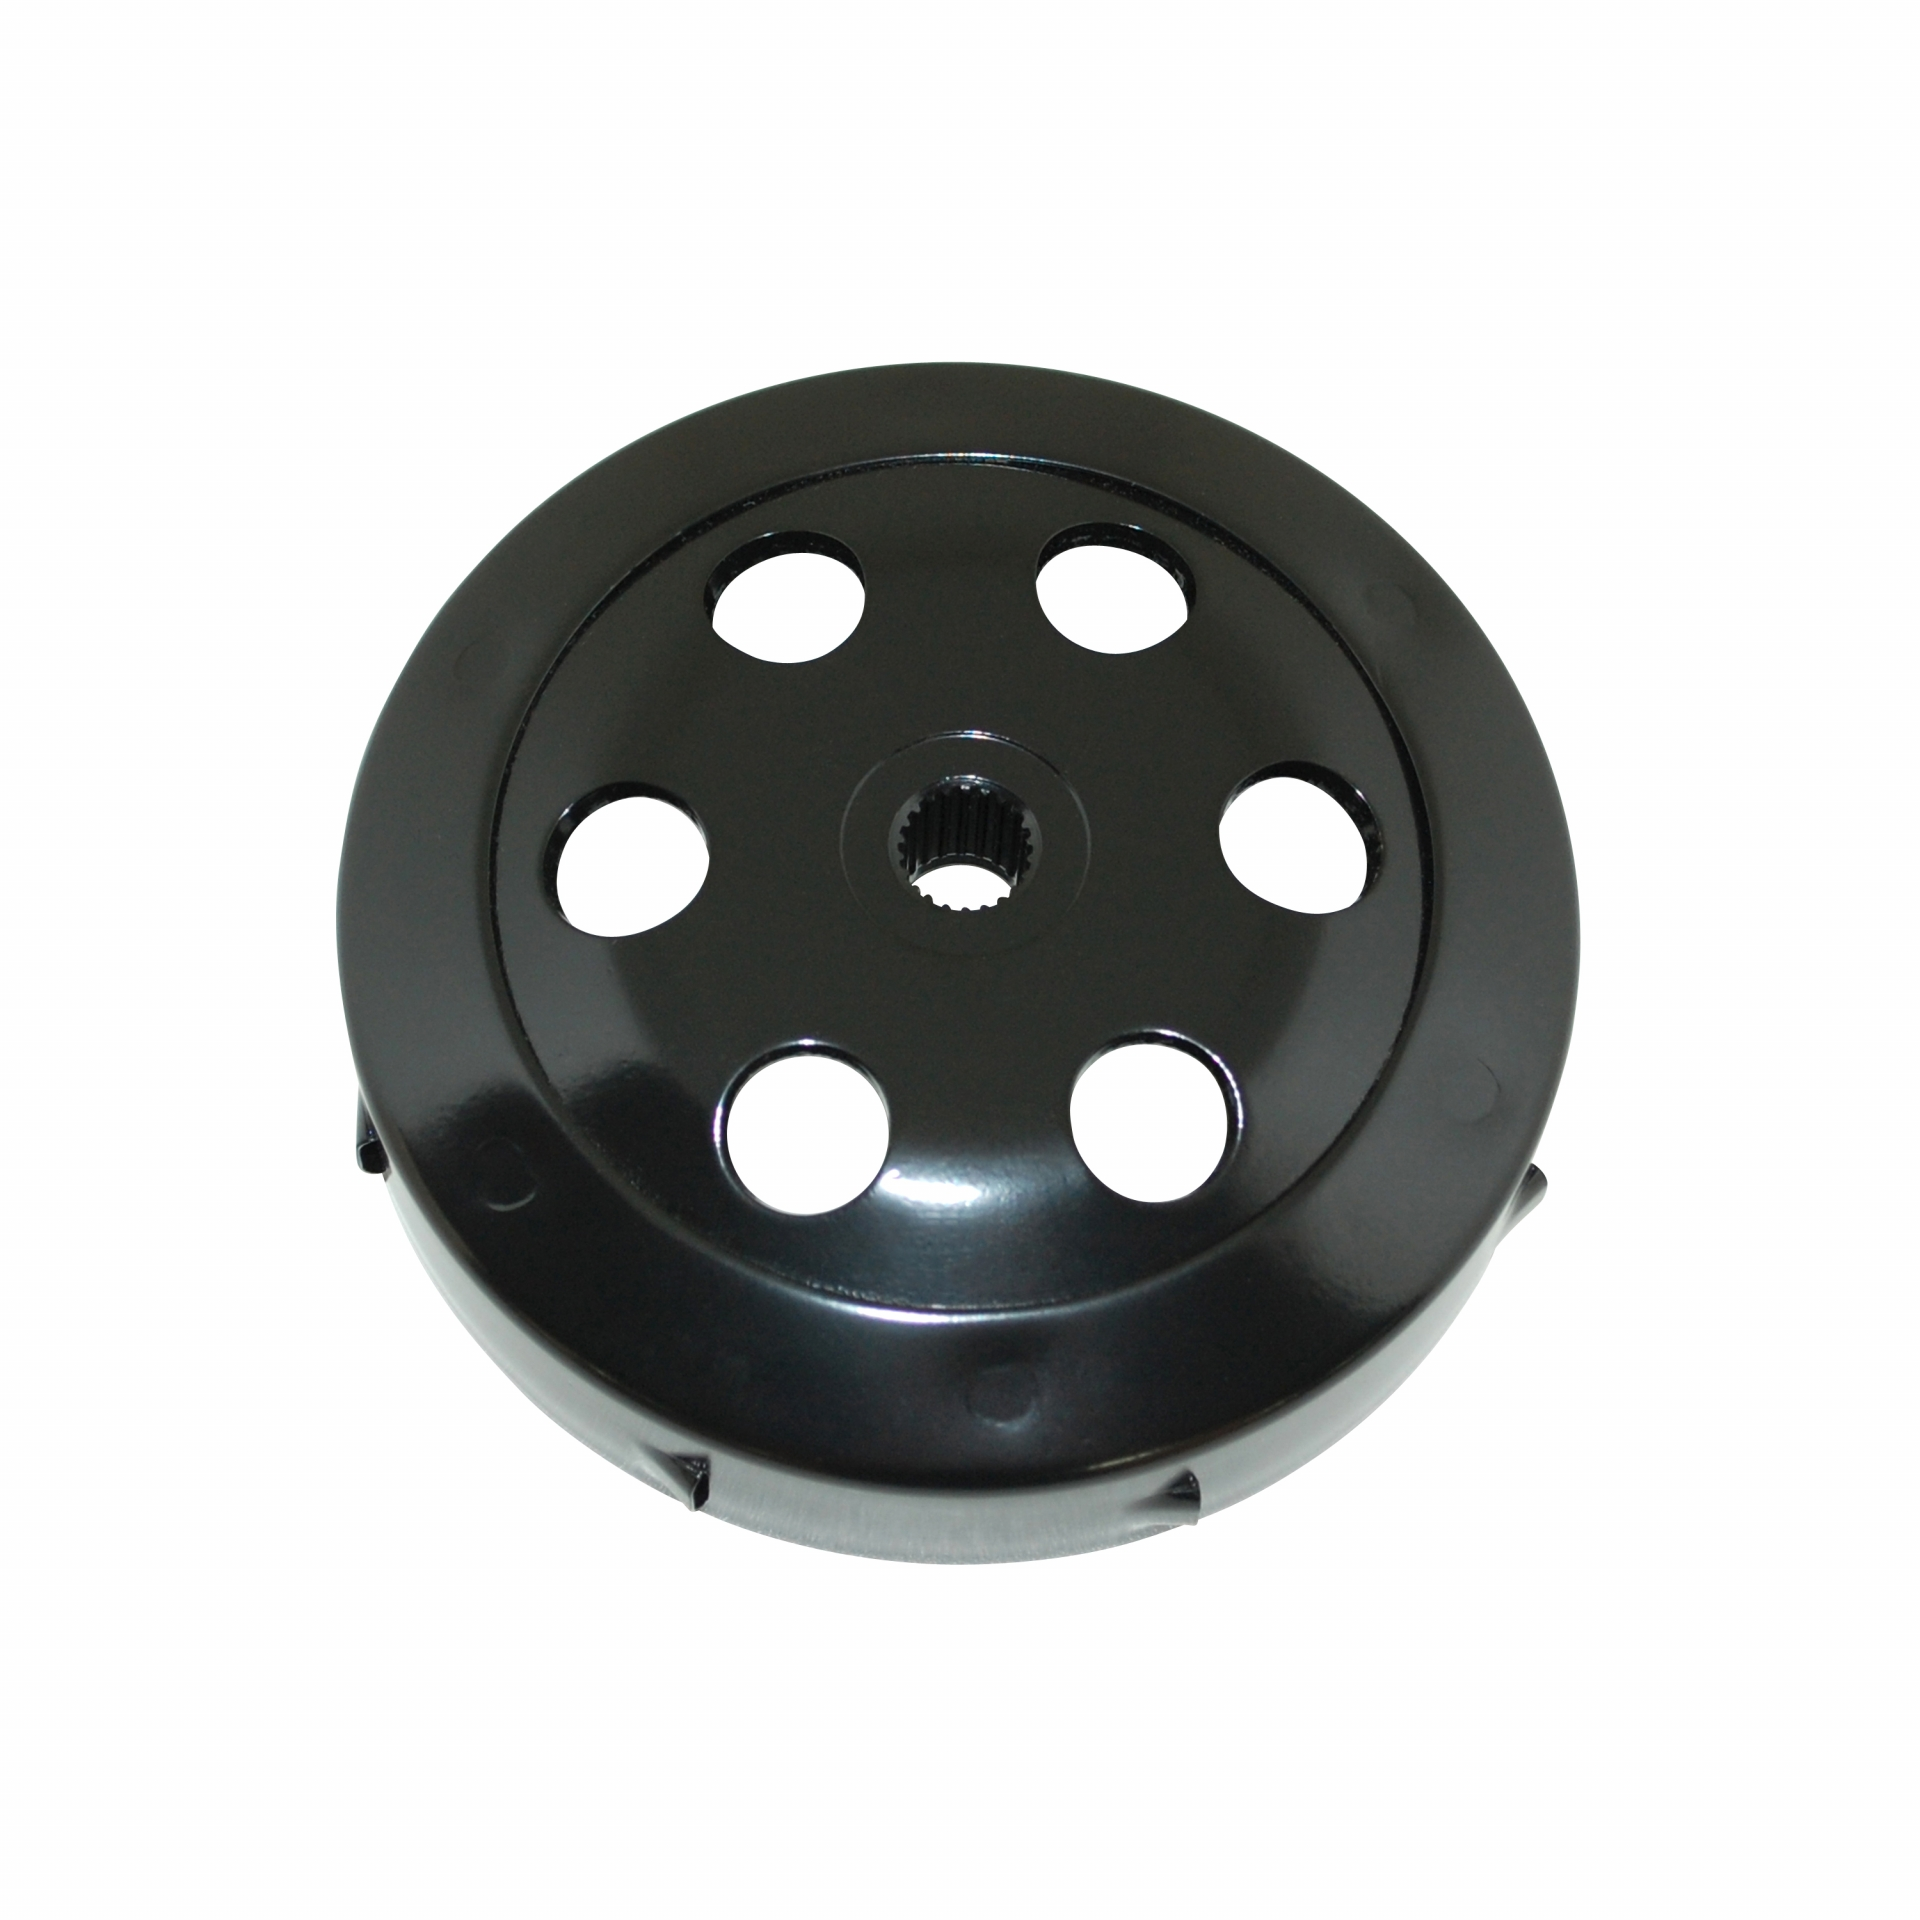 Cloche d'embrayage Replay black edition D.107 pour Booster/Nitro/sr50/